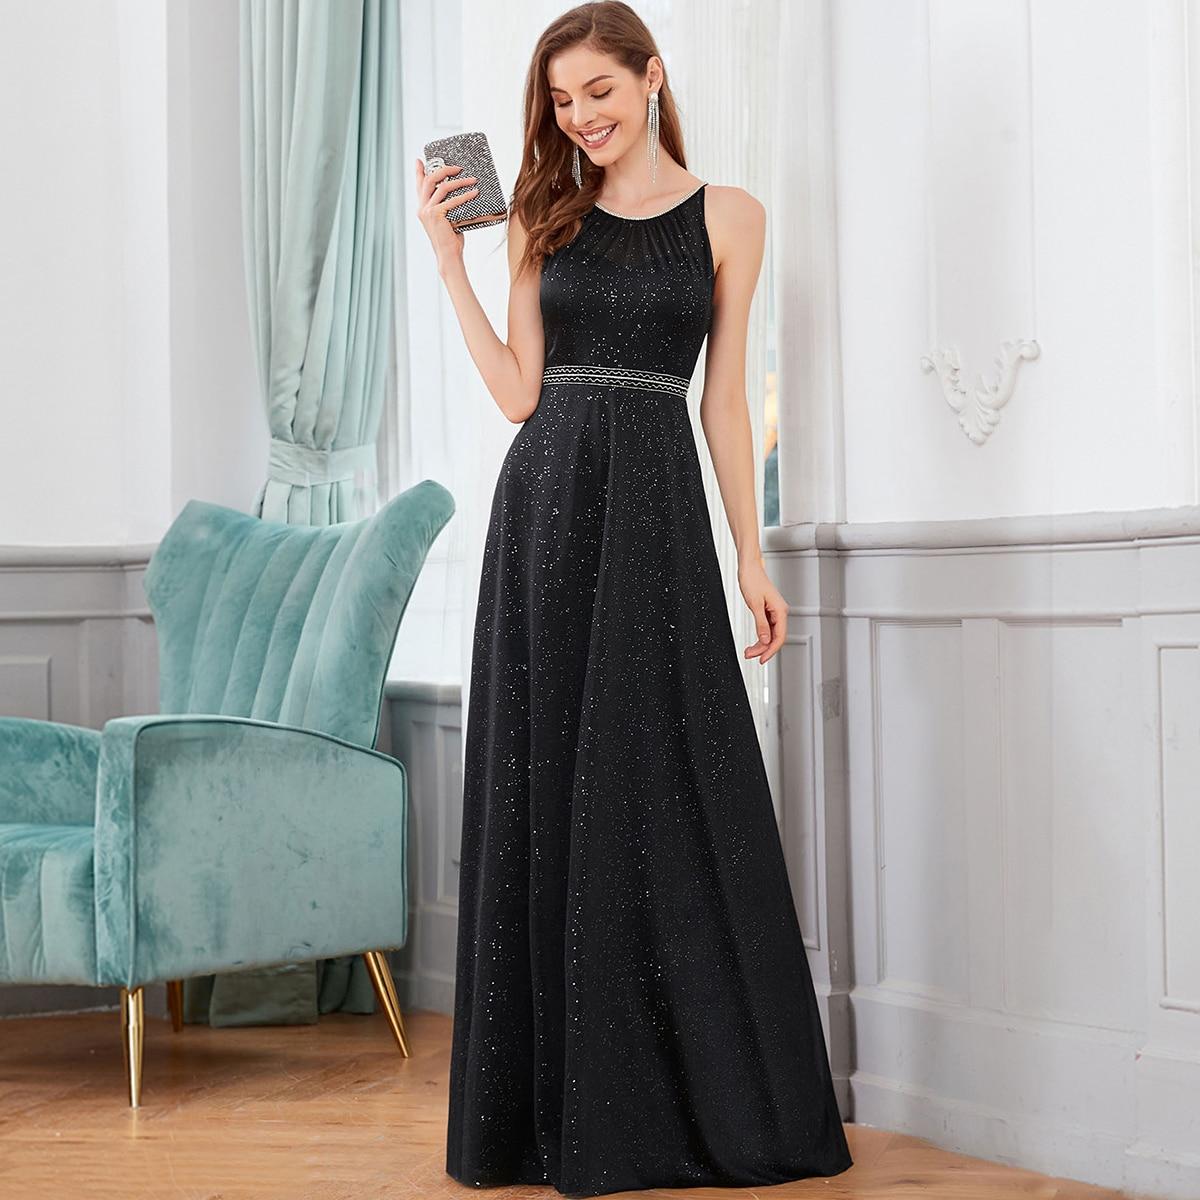 Rhinestone Detail Glitter Cami Prom Dress